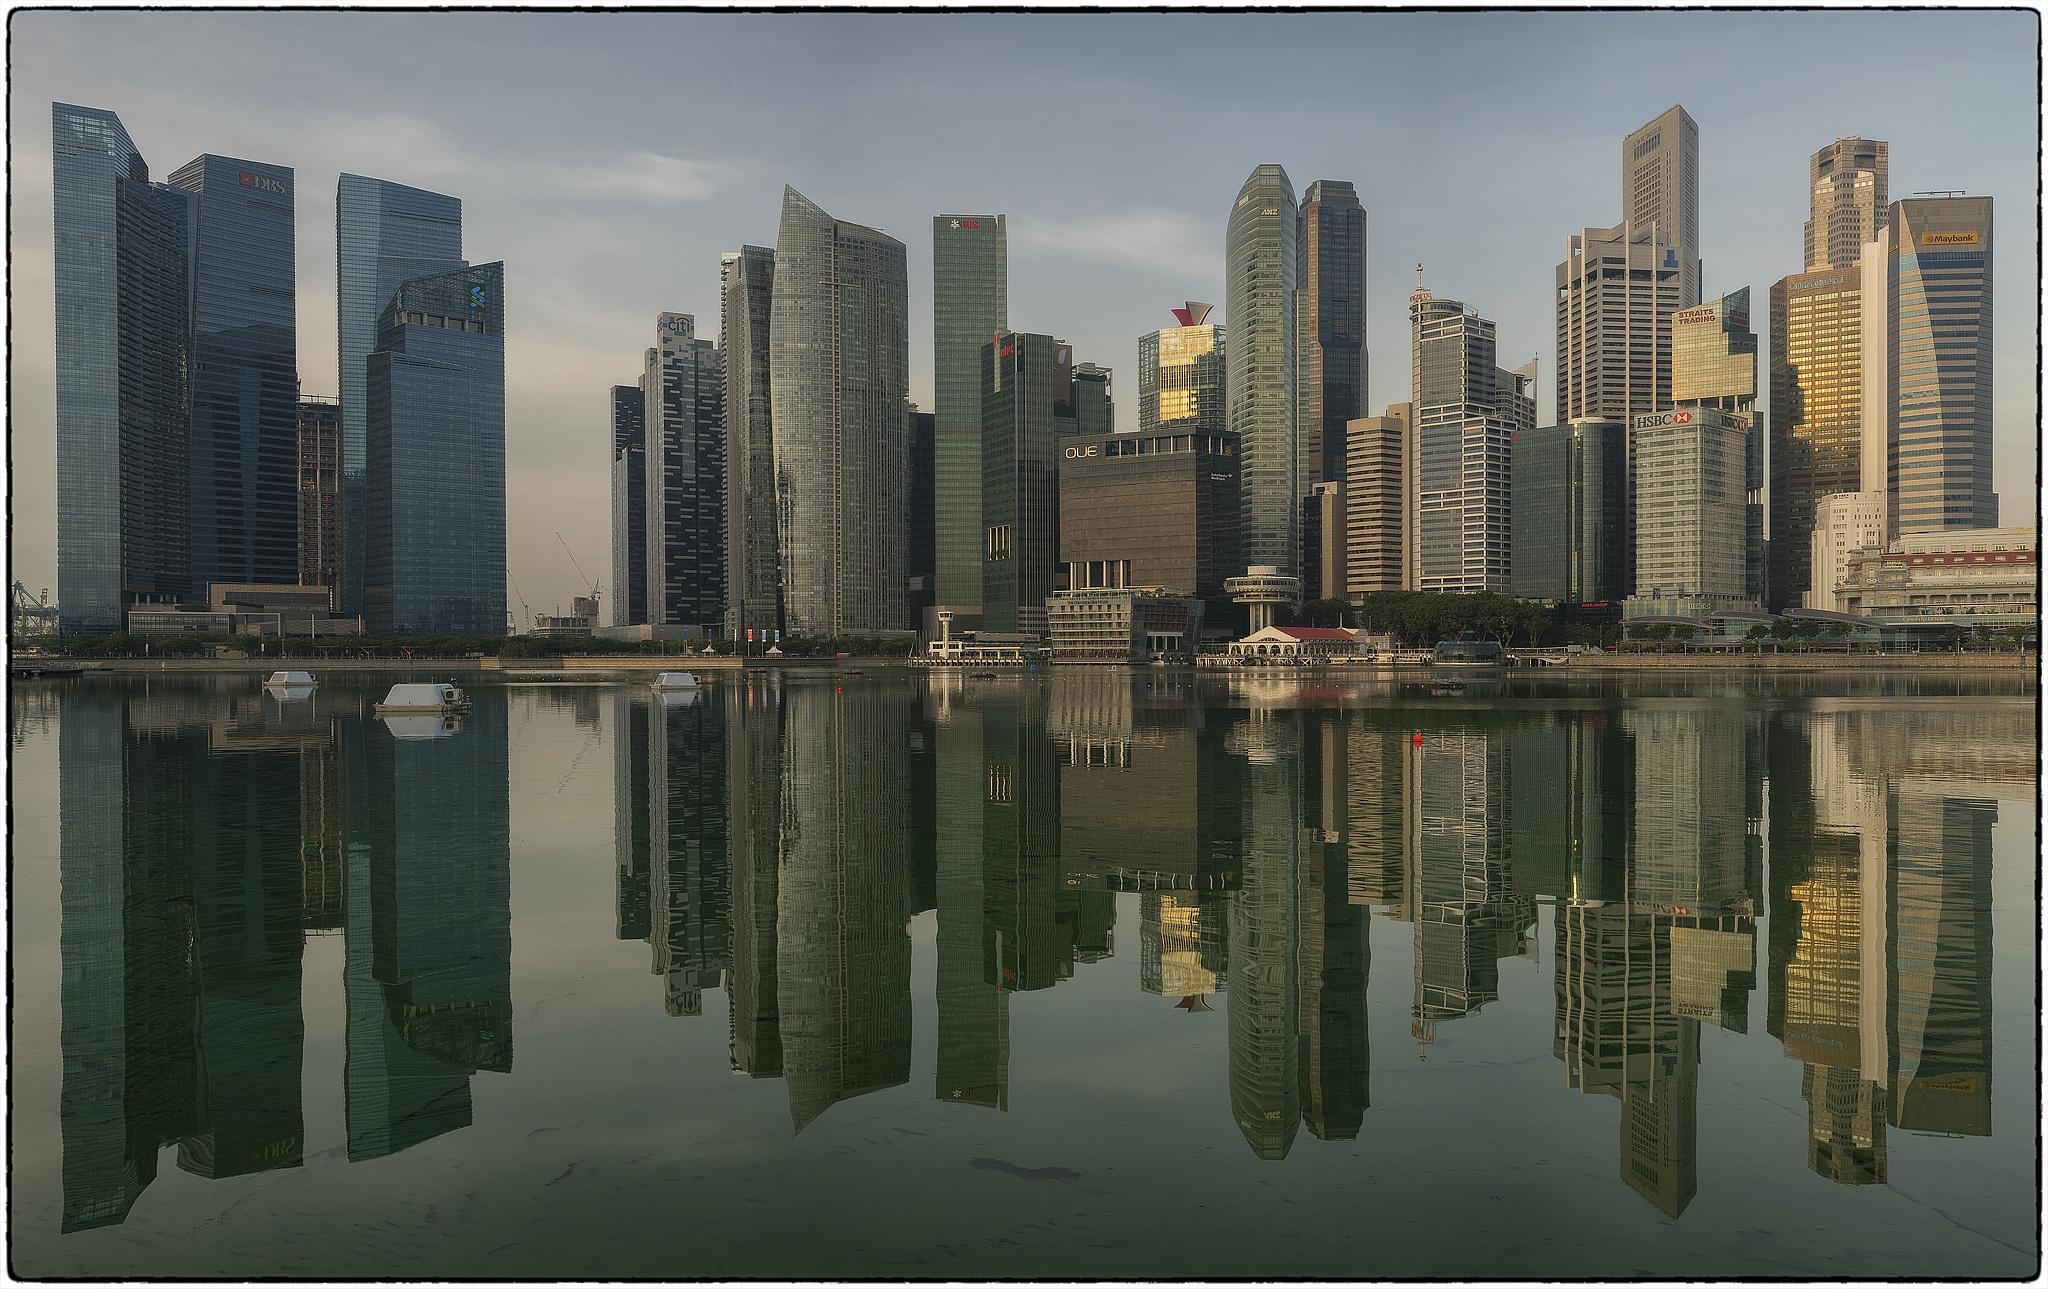 The Mirror City by mathori